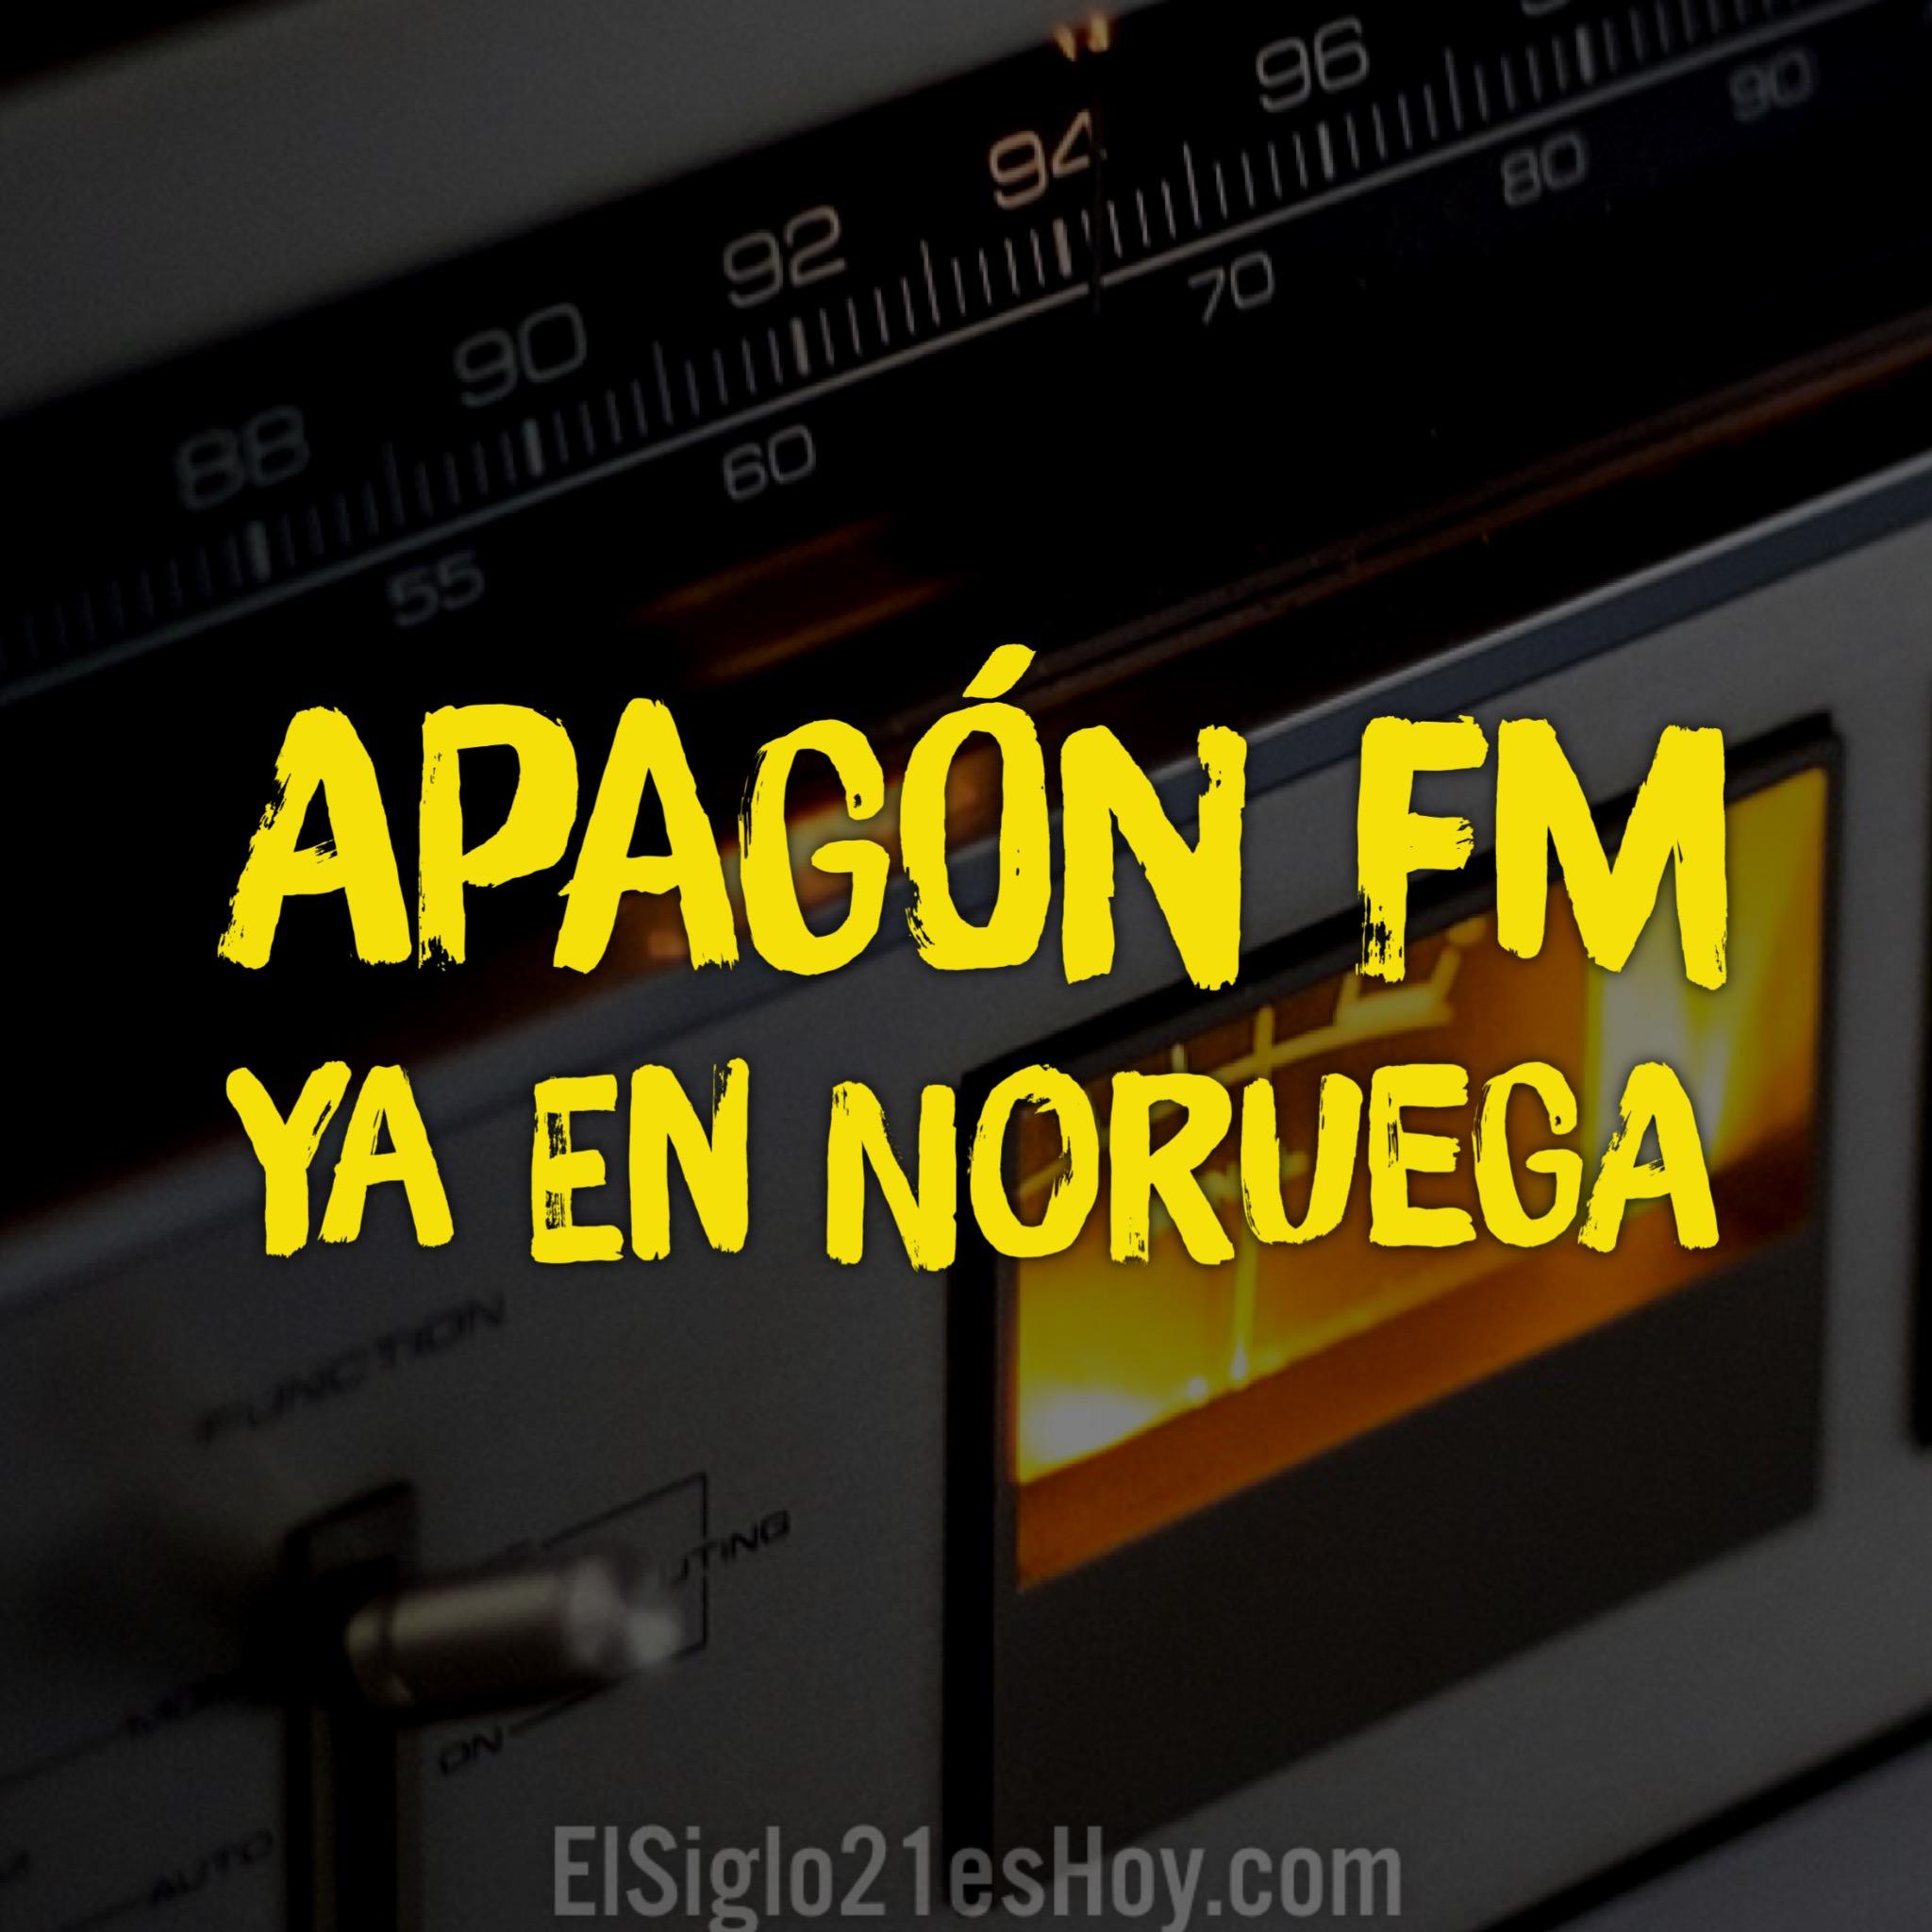 Rcn radio barranquilla online dating